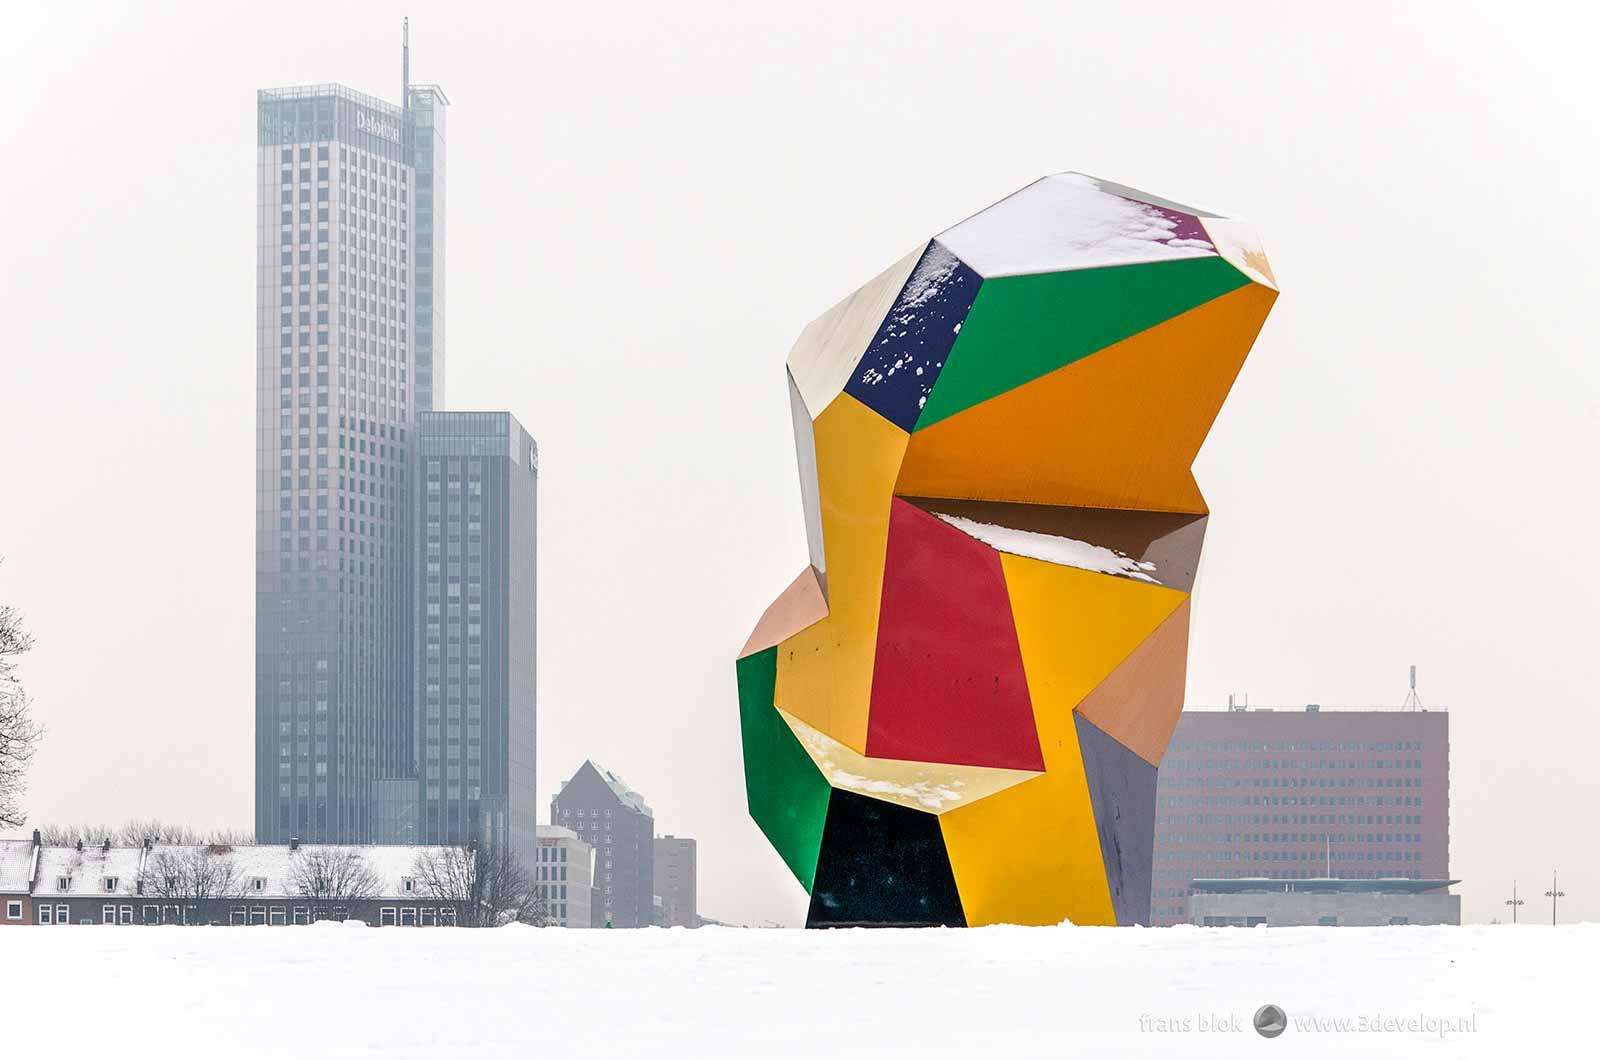 The colorful Marathon sculpture near Erasmusbridge in Rotterdam is a striking contrast with freshly fallen snow